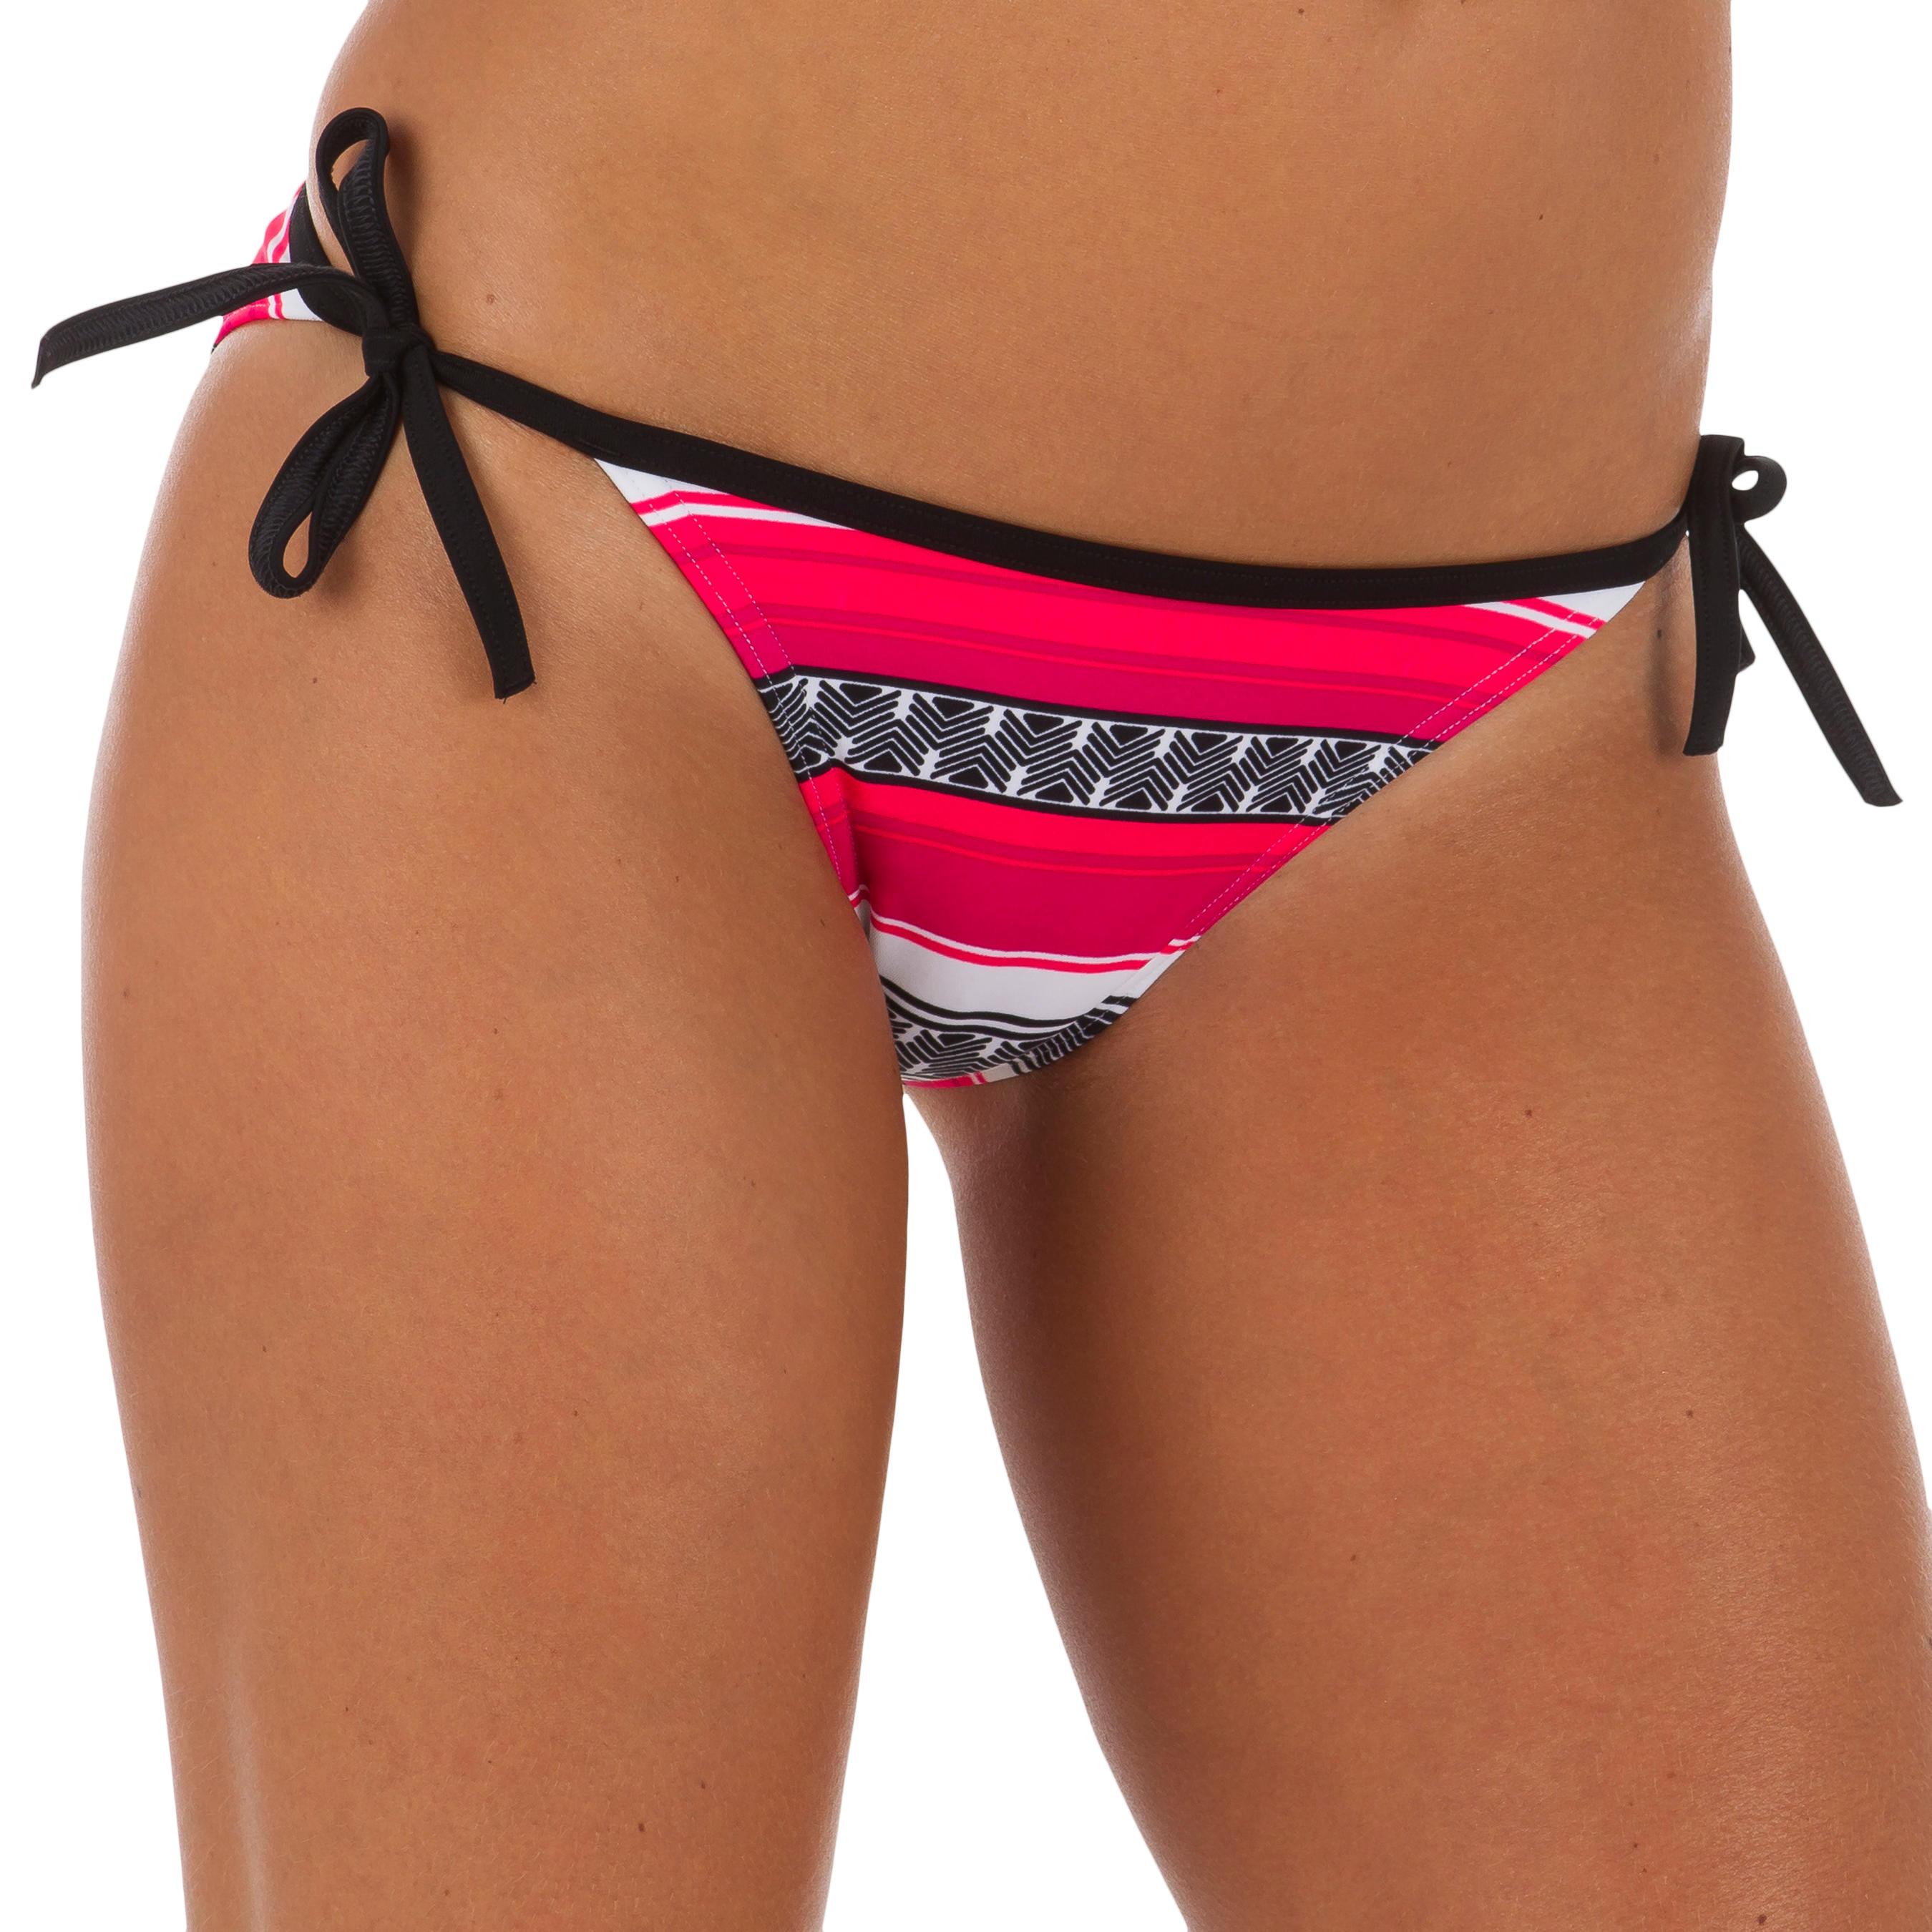 Panty bikini anudada a los lados SOFY GUARANA